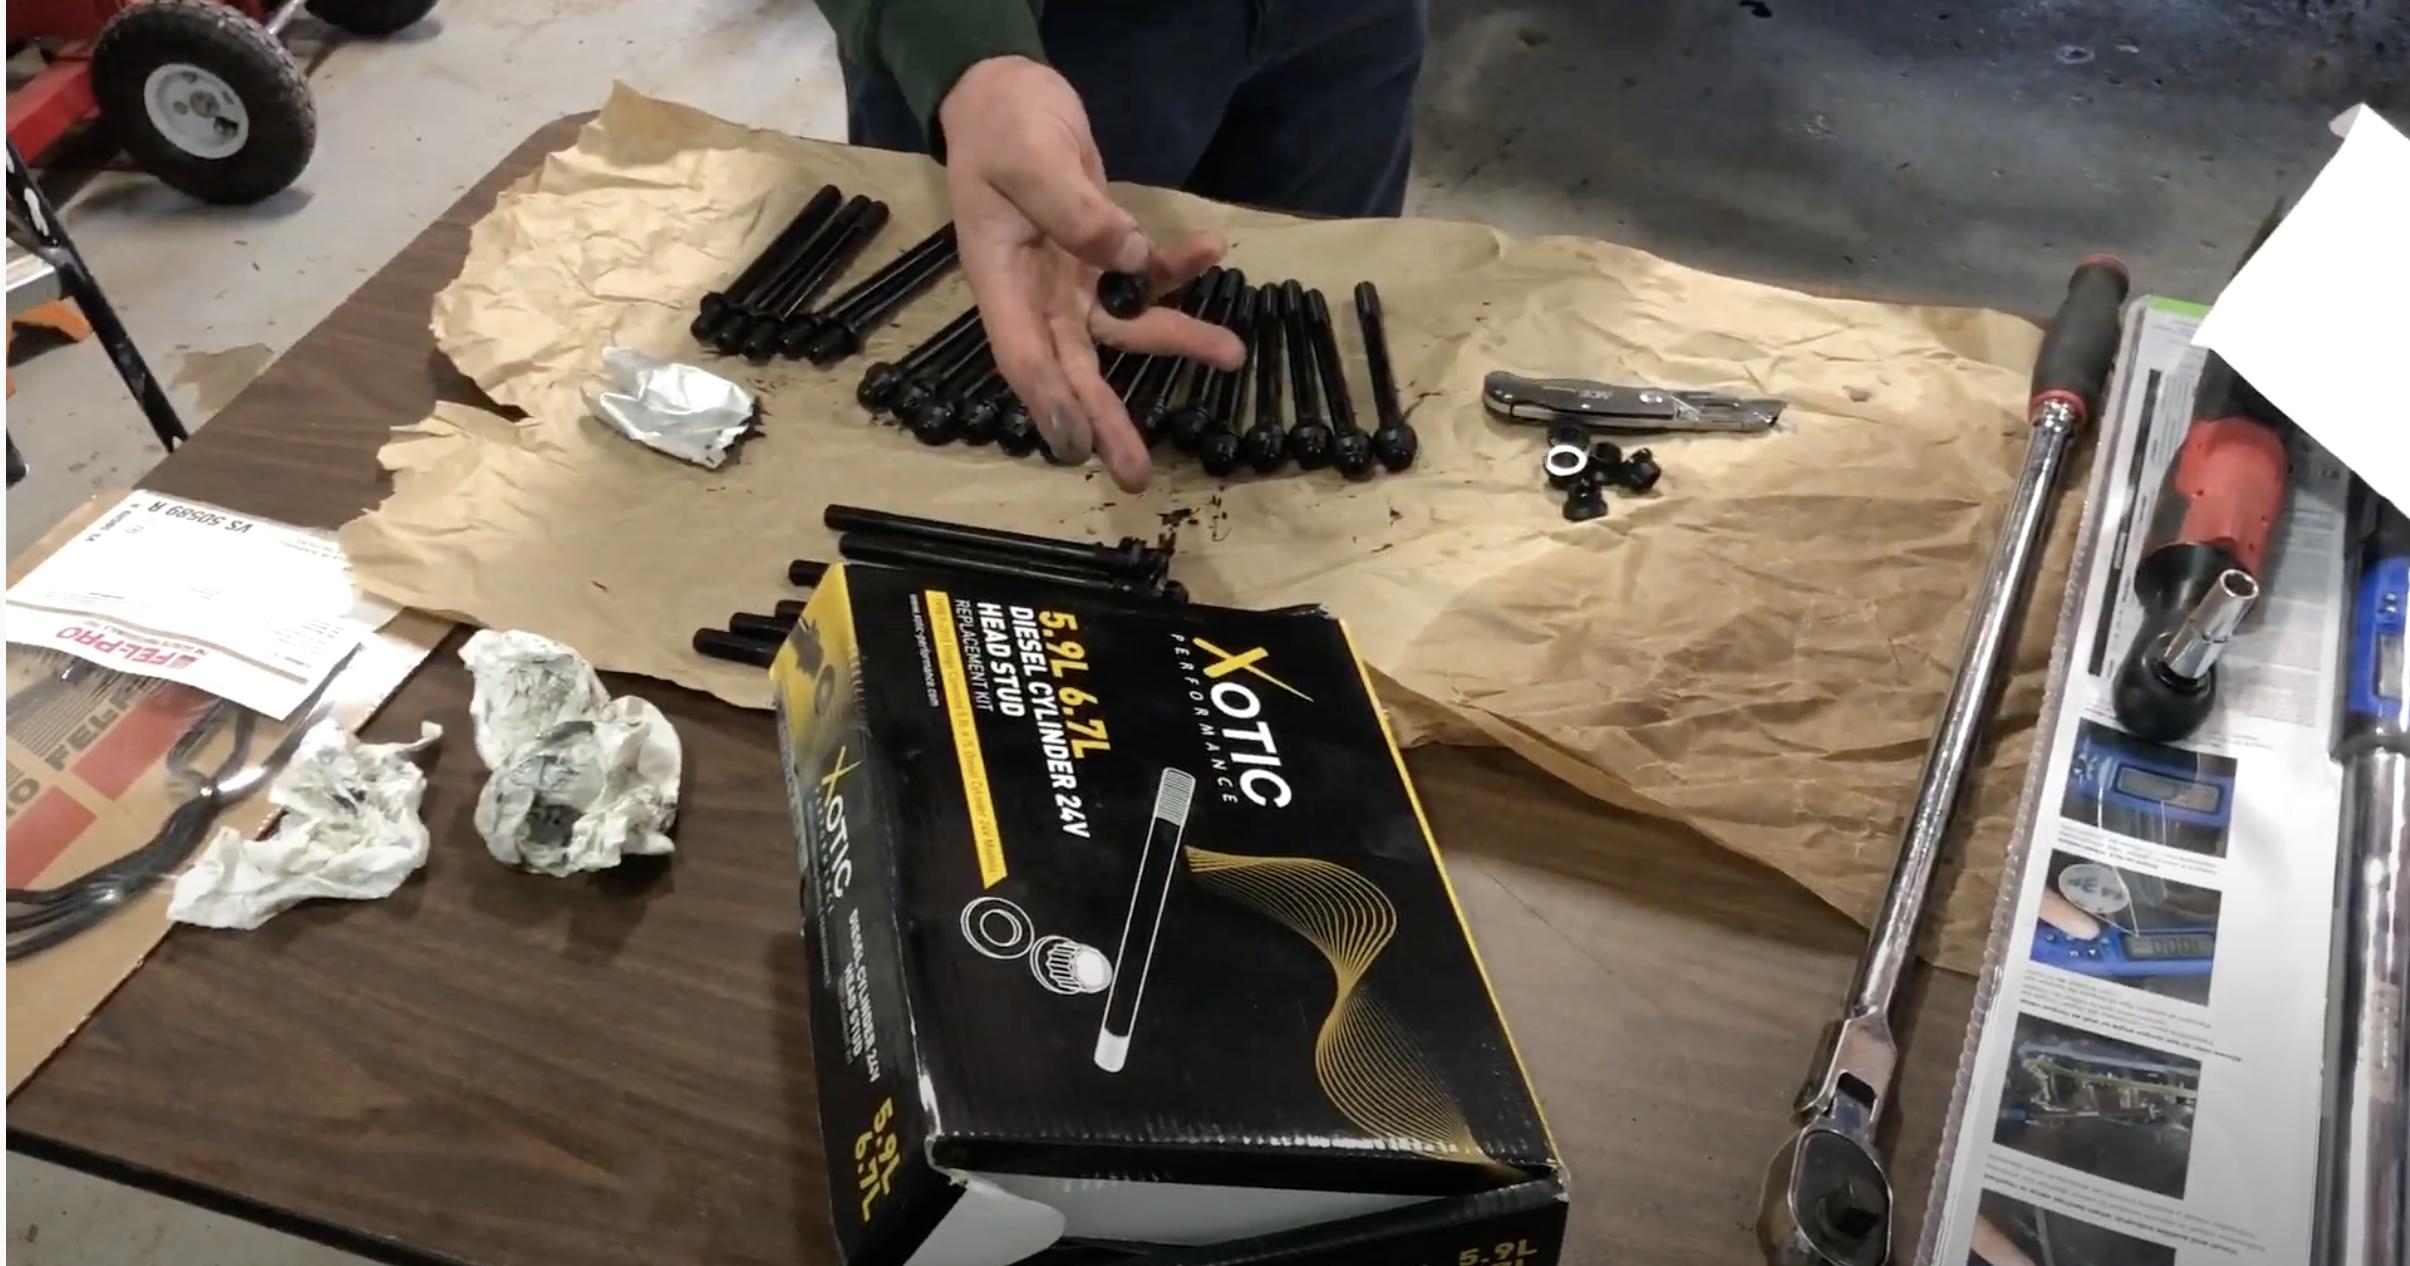 Set of 16 ARP 1001403 Black Oxide Chrome Moly Steel 12-Point Stud Kit